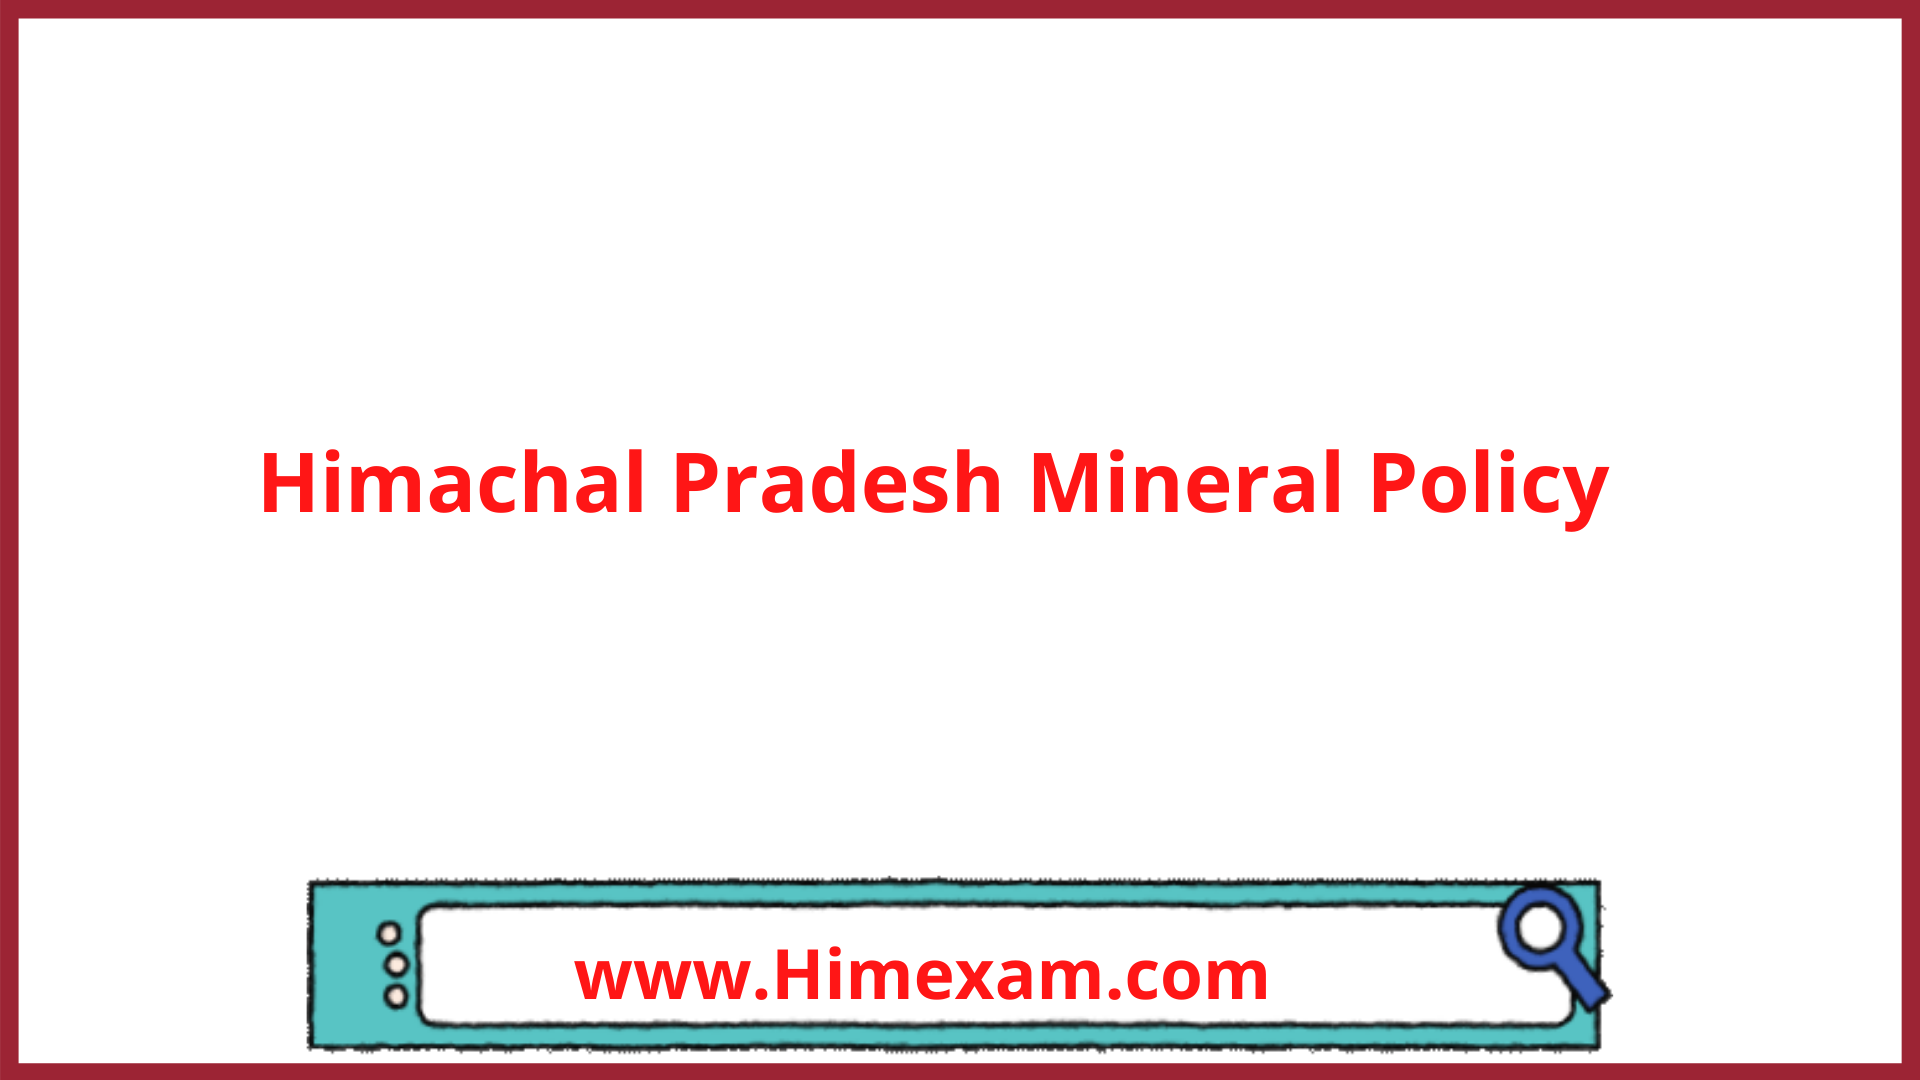 Himachal Pradesh Mineral Policy